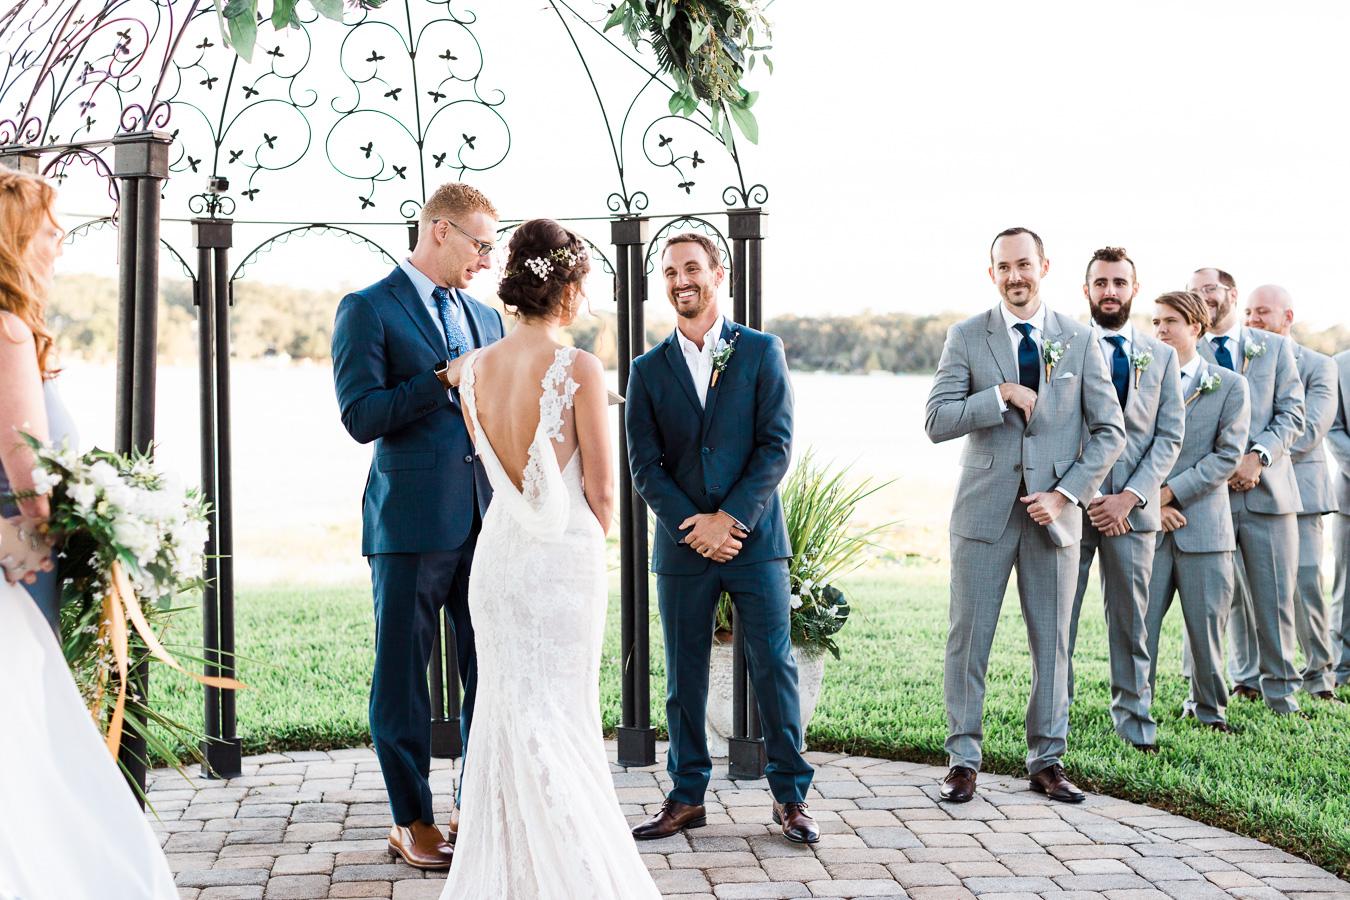 Wedding-photographer-orlando-75.jpg